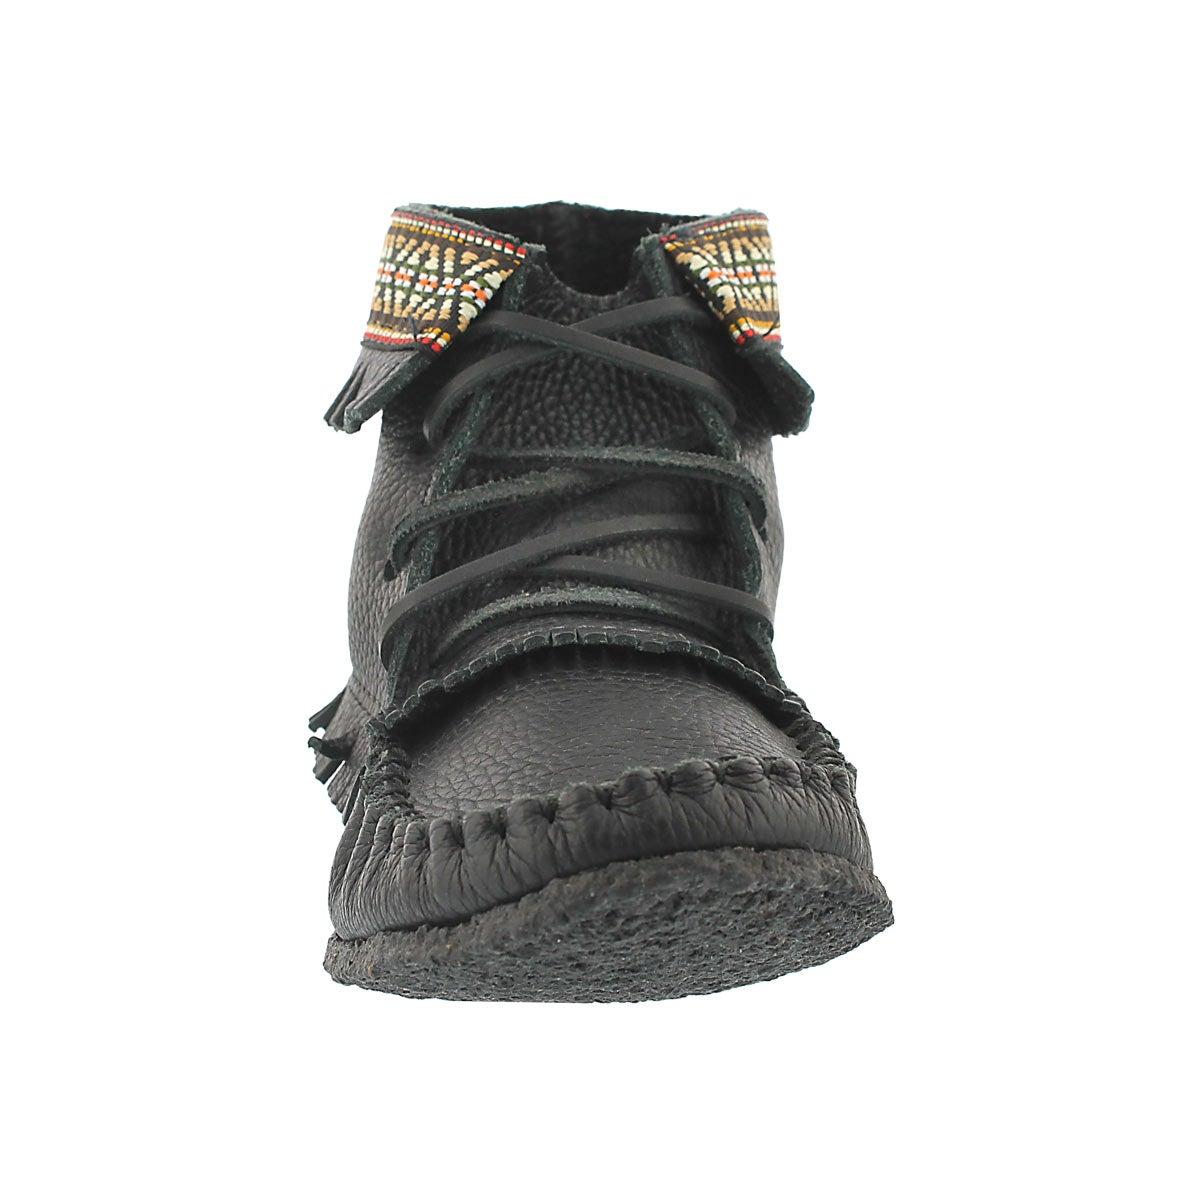 Lds black gum sole fringe bootie mocc